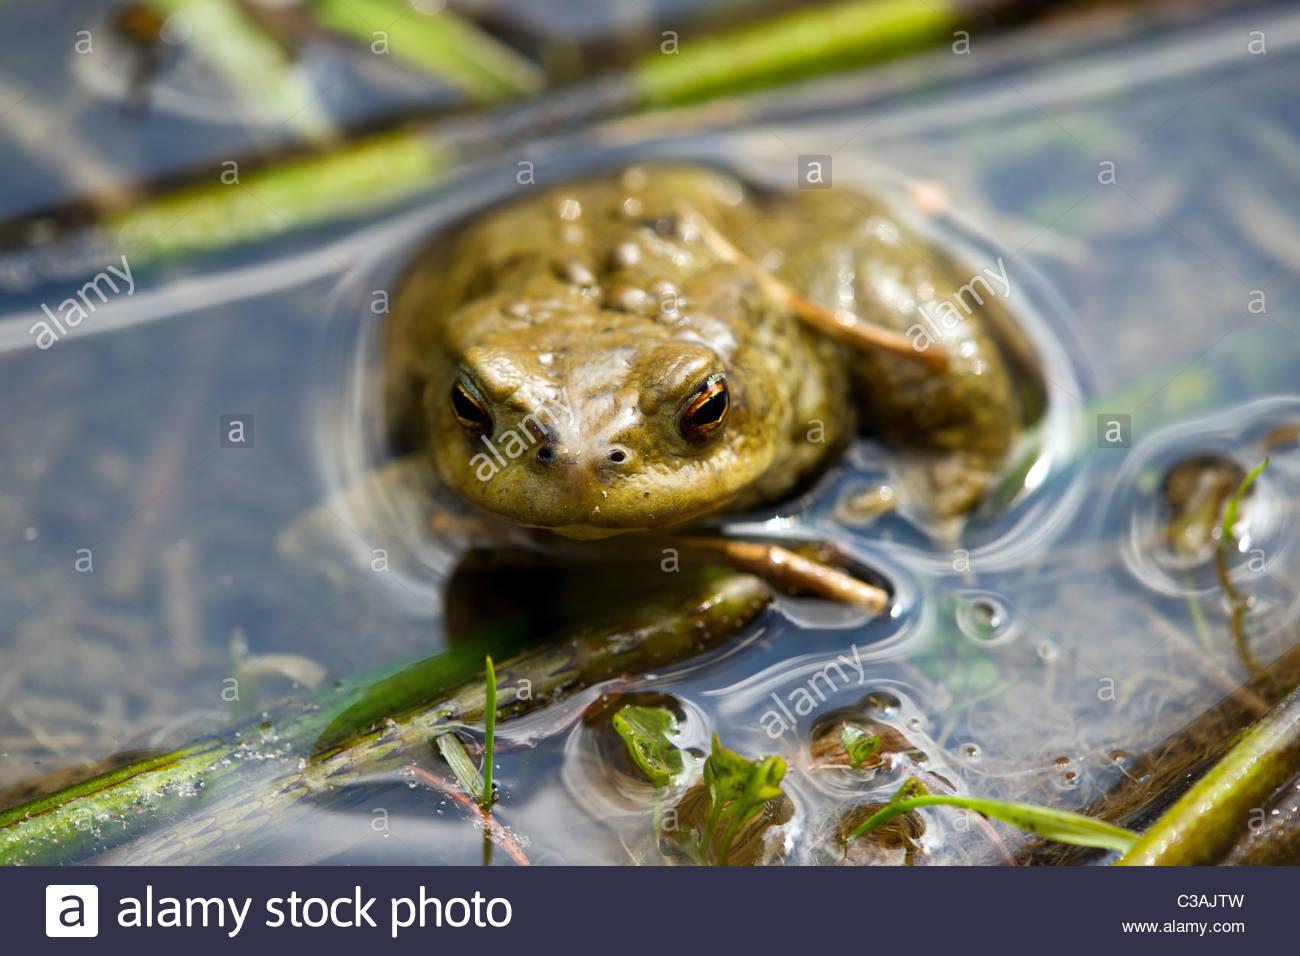 European common toad - Bufo bufo Stock Photo